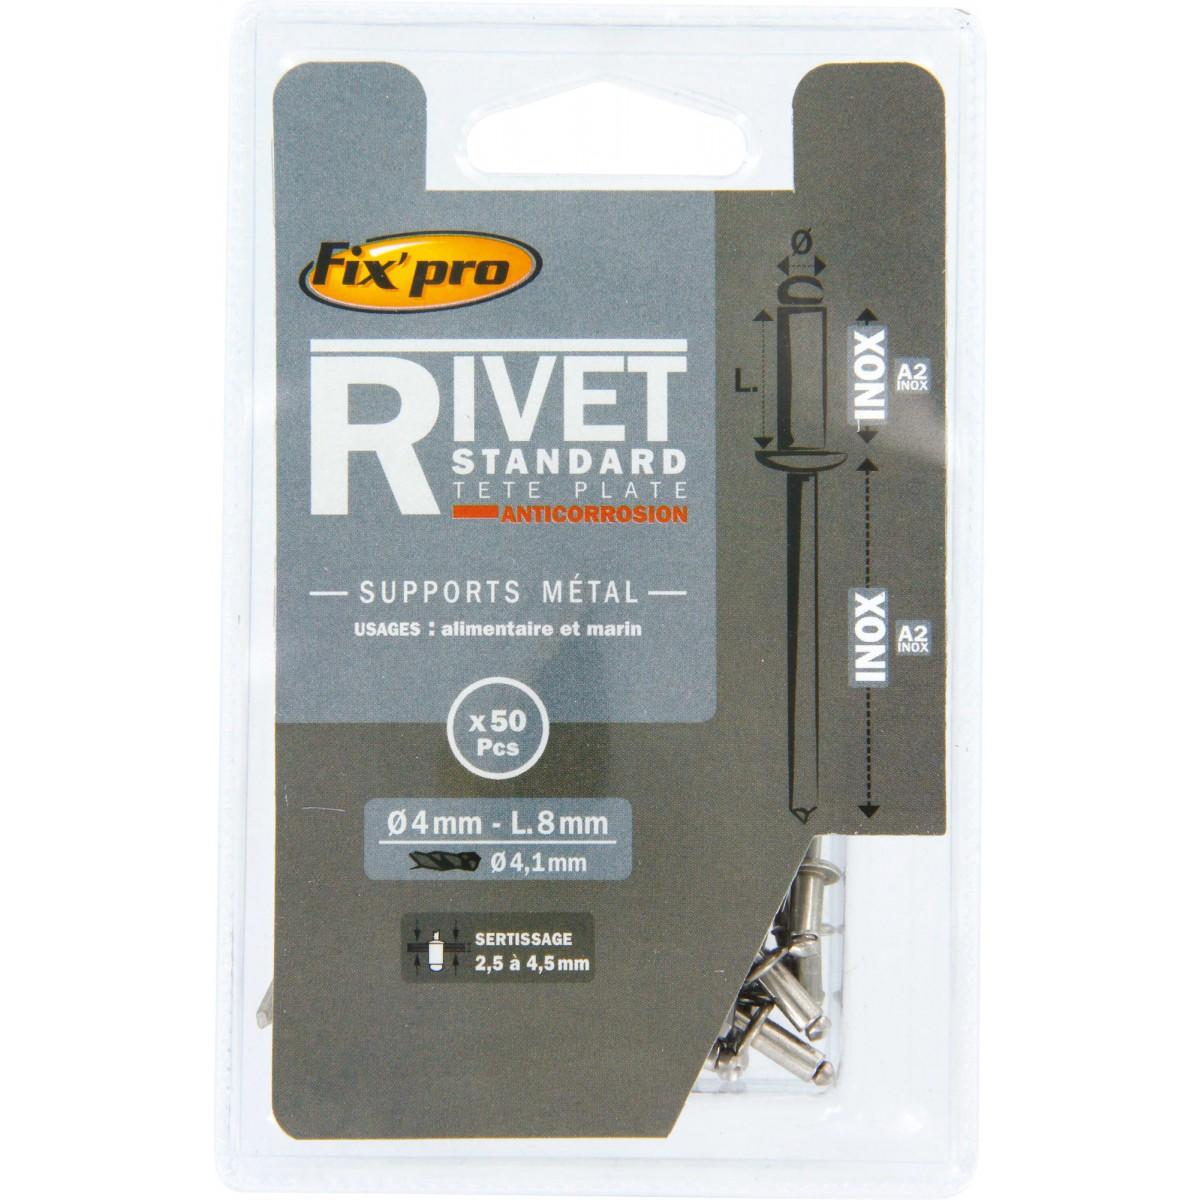 Rivet aveugle tête plate inox / inox A2 Fix'Pro - Longueur 8 mm - Diamètre 4 mm - Vendu par 50